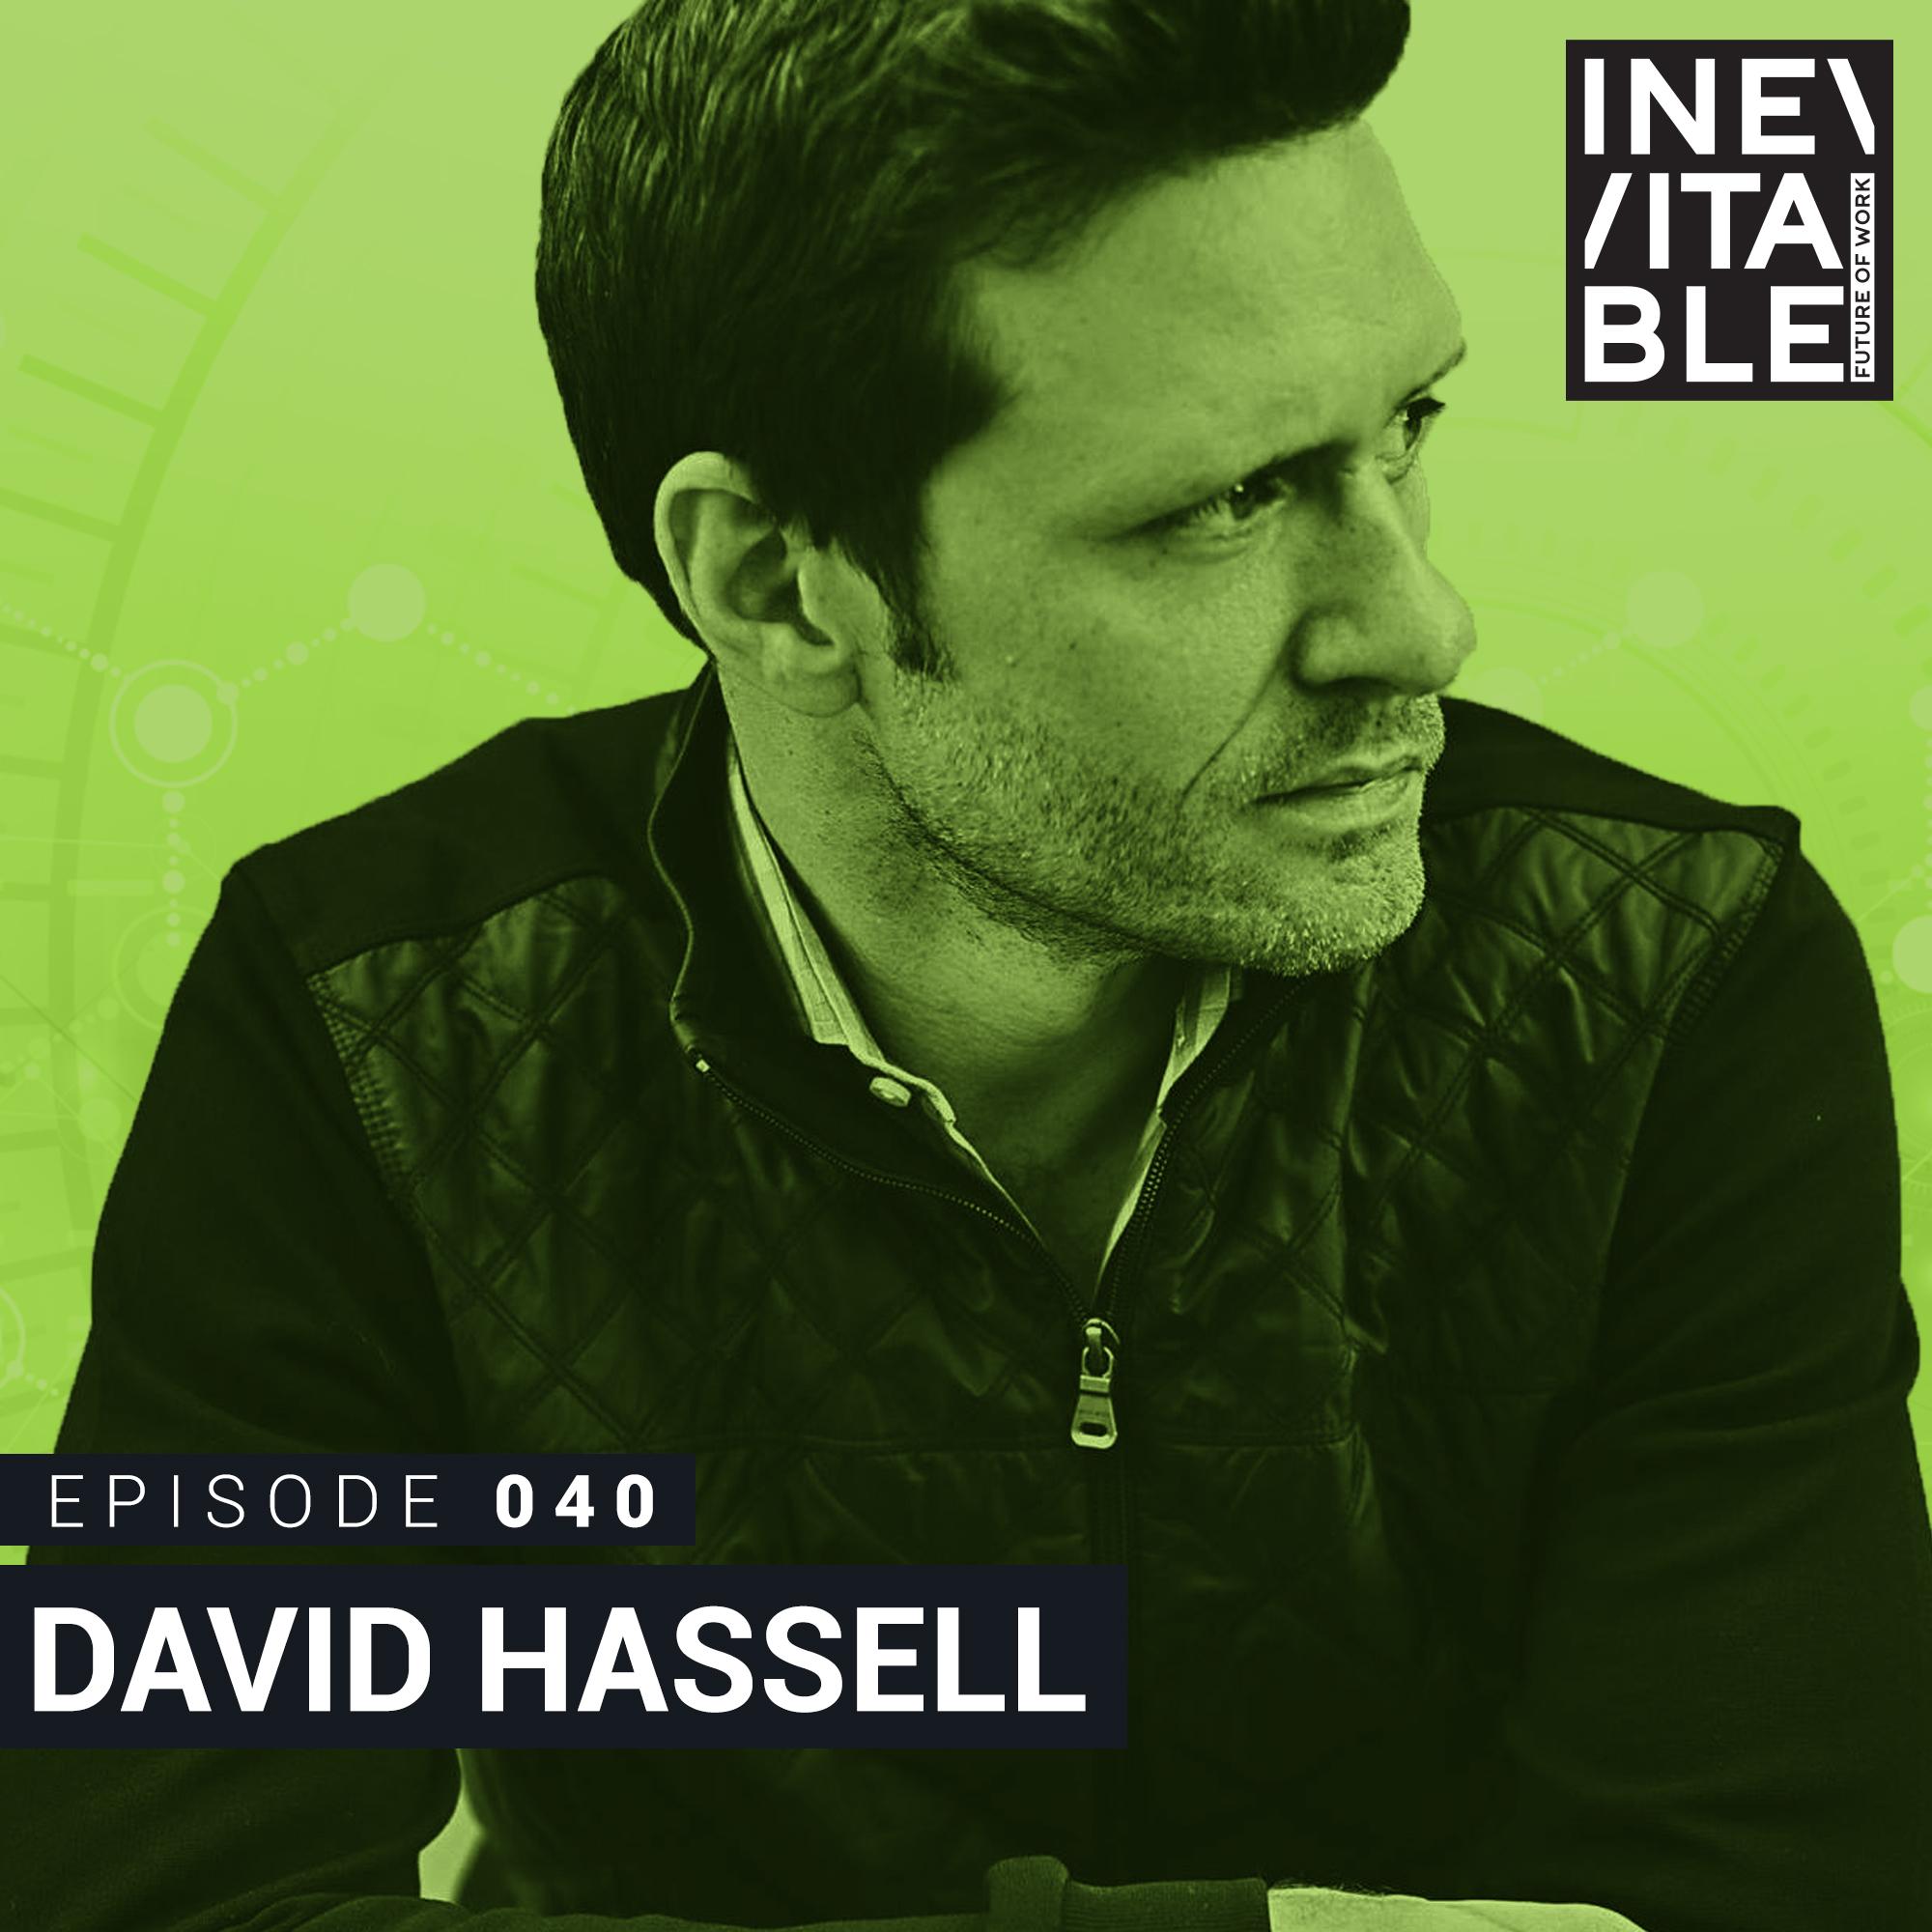 David Hassell